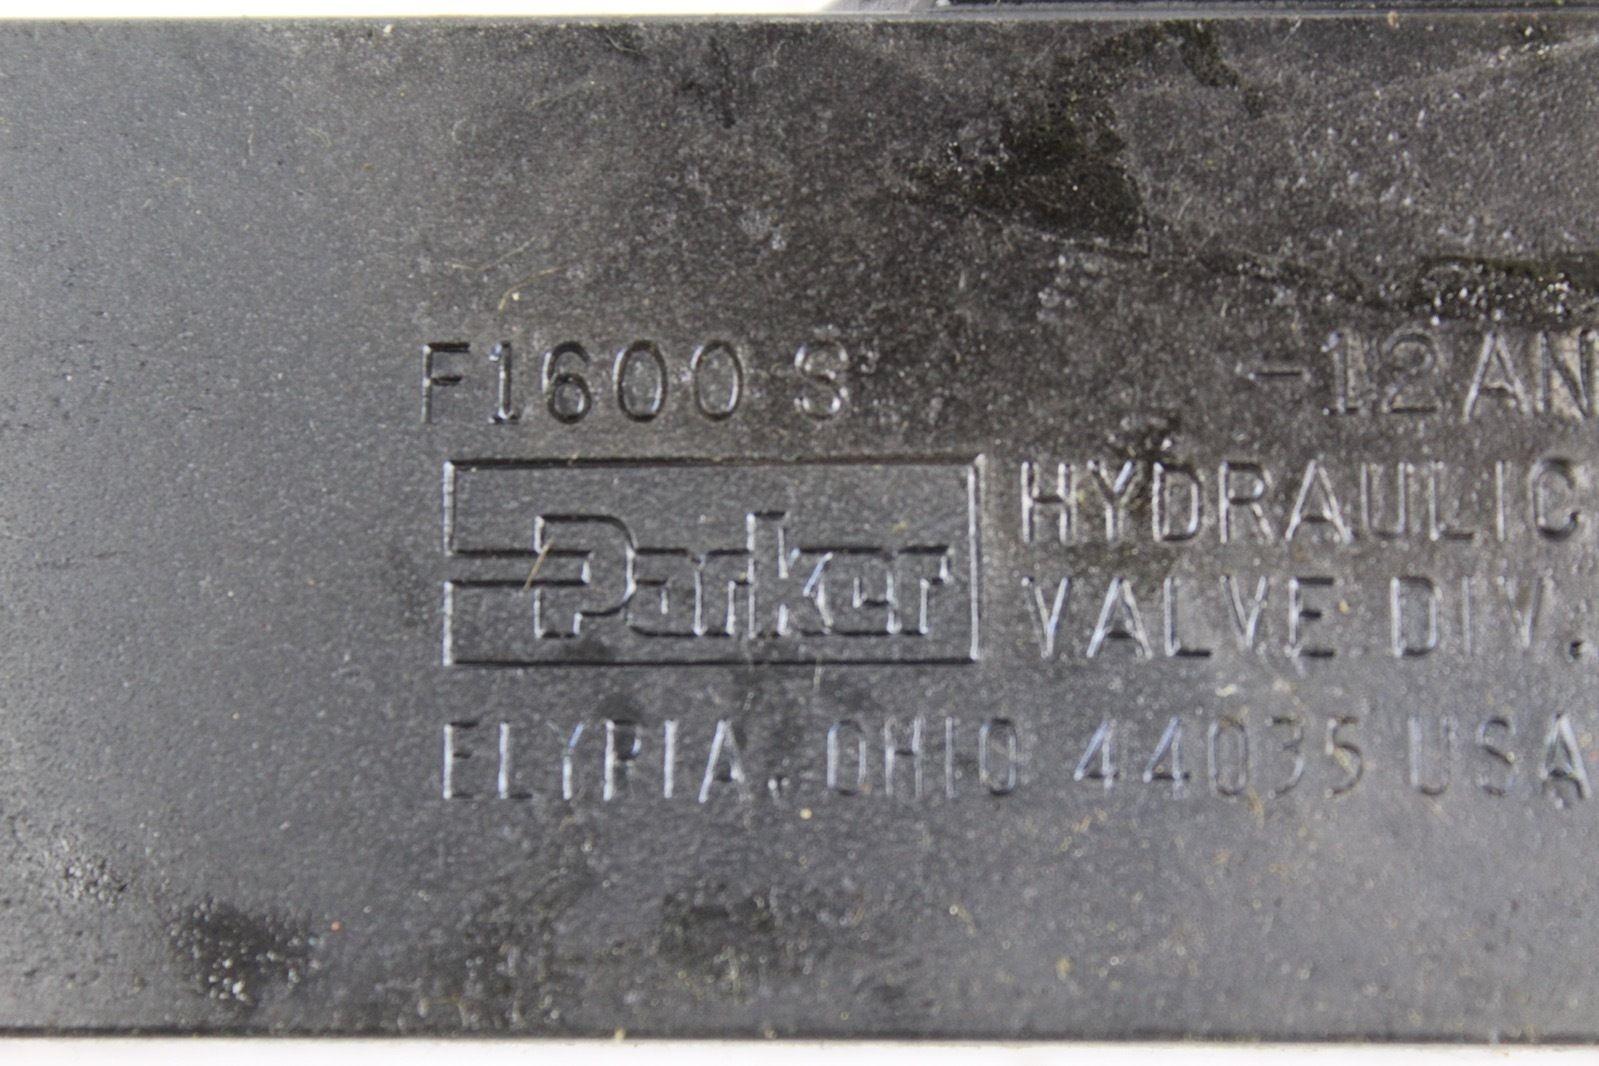 Parker Hydraulic Flow Control F1600S *NEW* (B272) 2